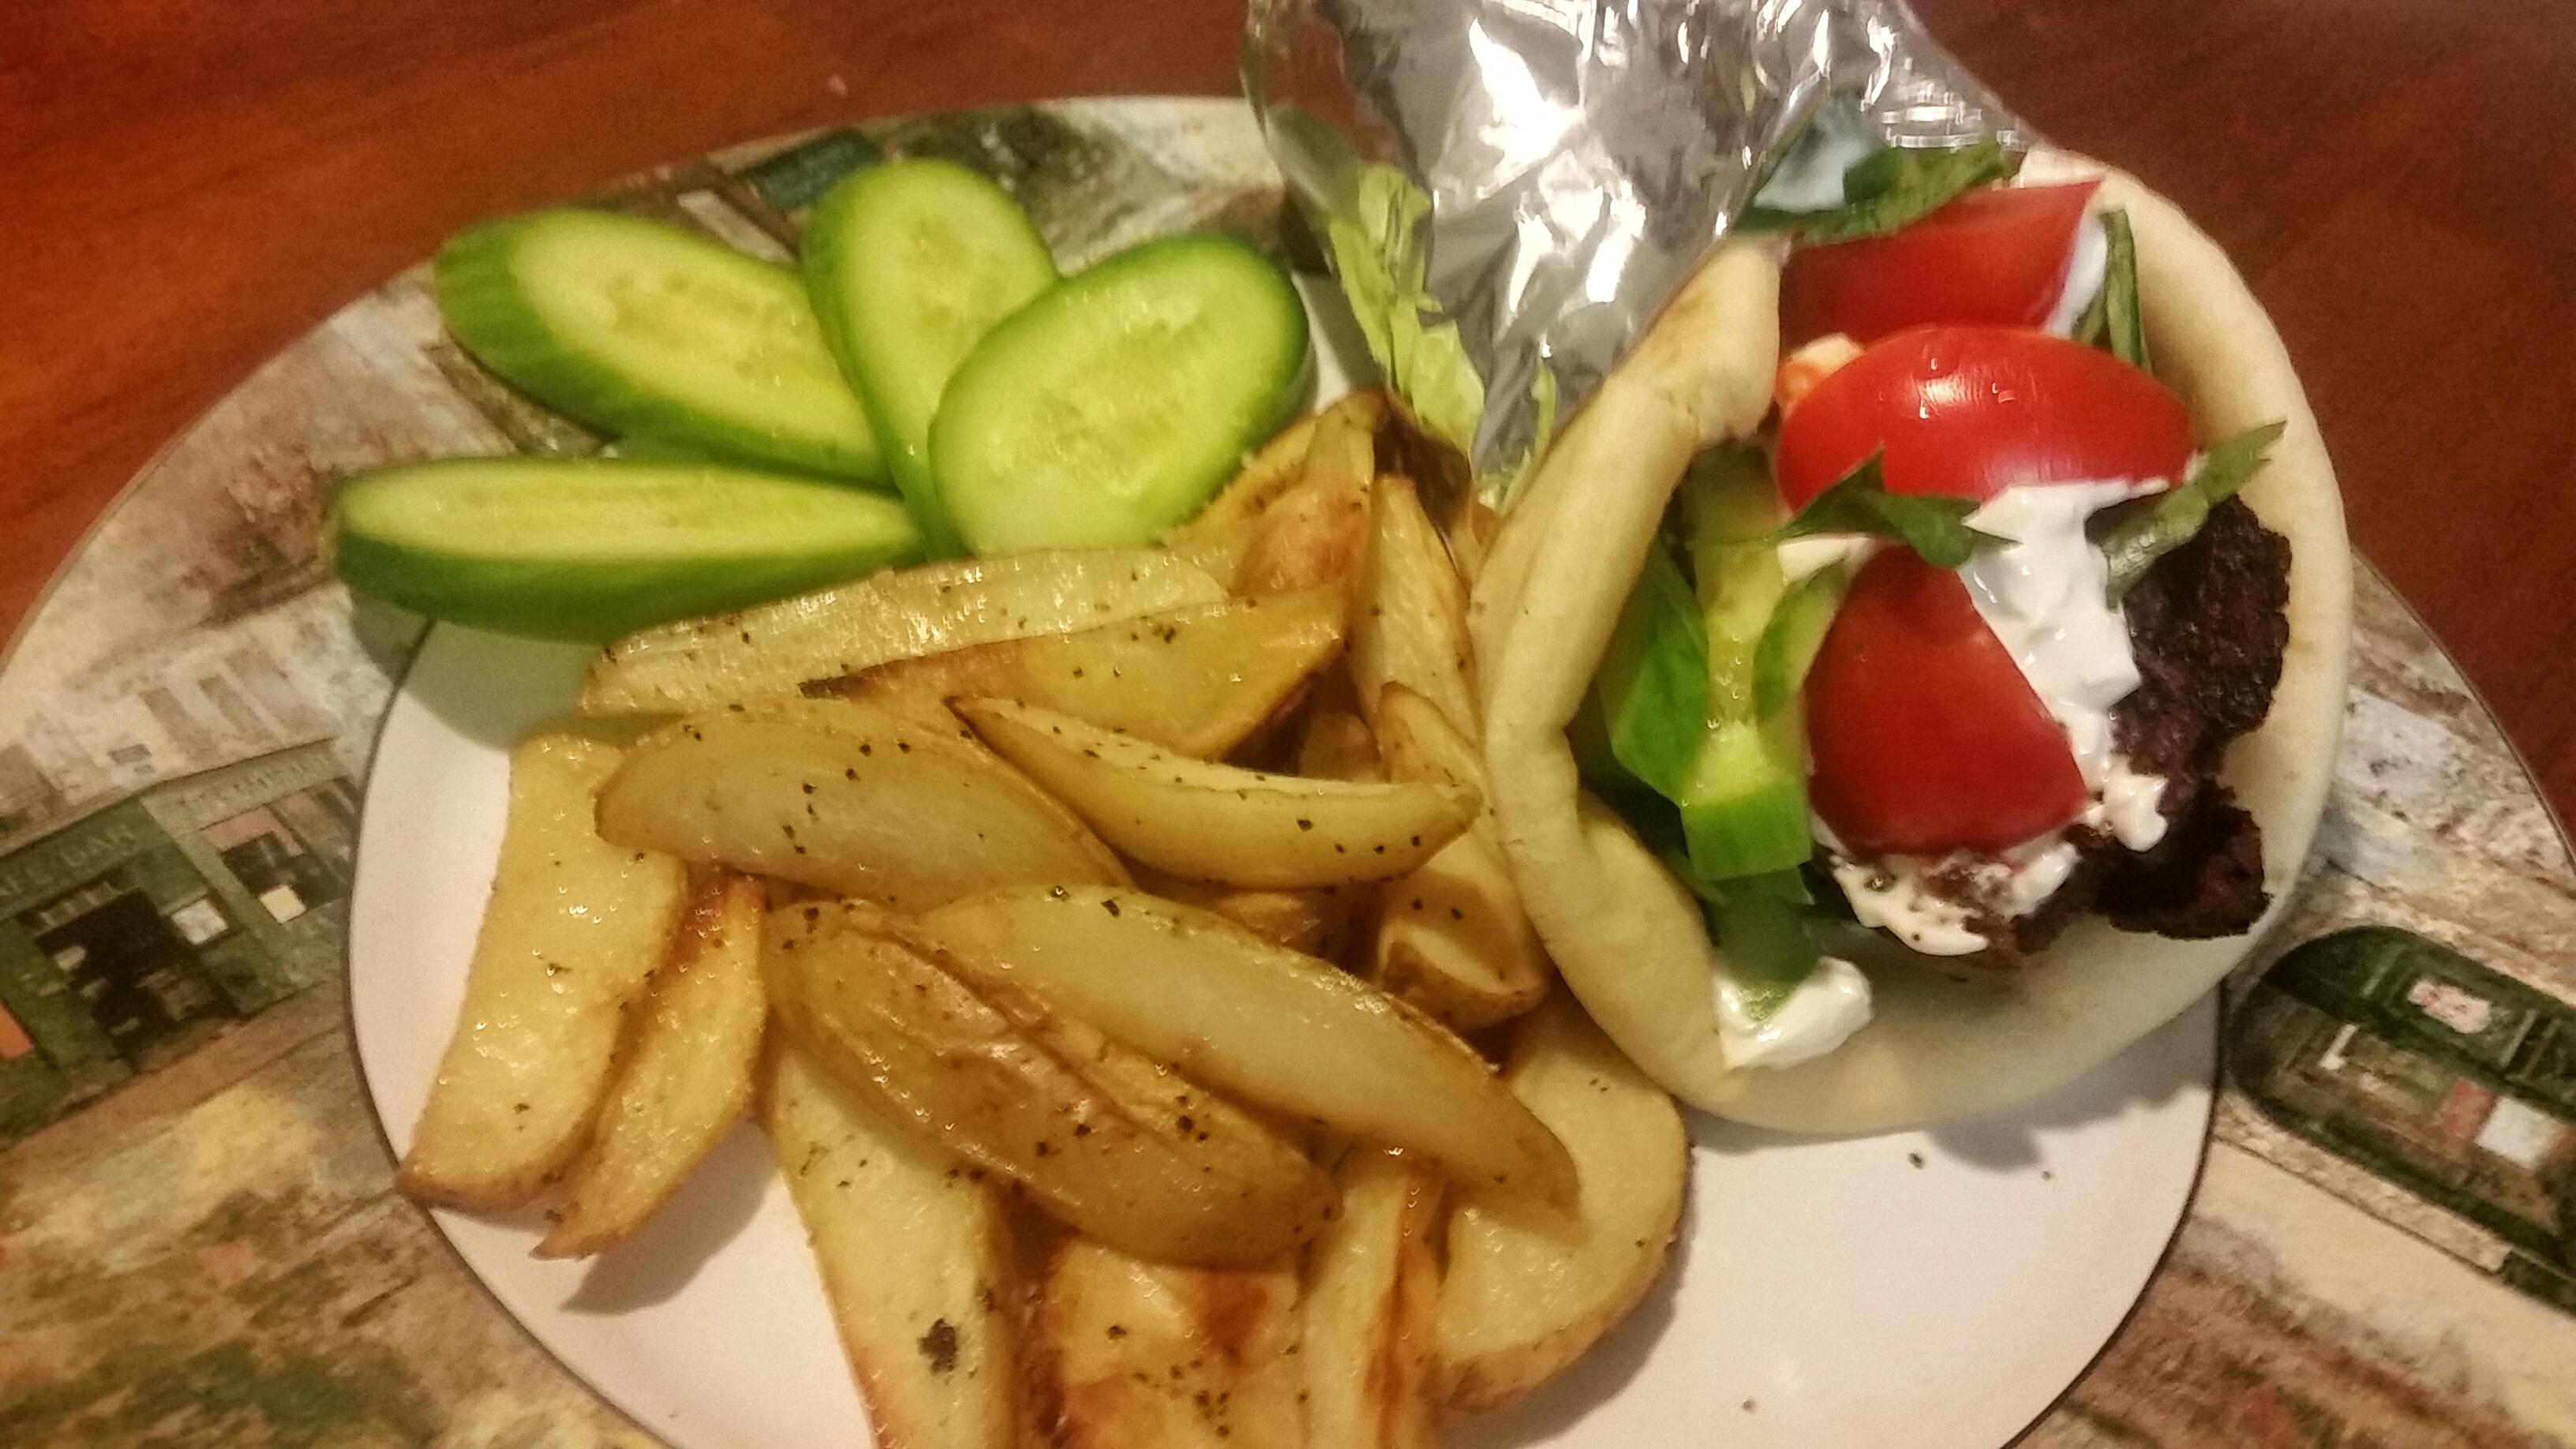 Gyro from scratch with Greek Seasoned Potato